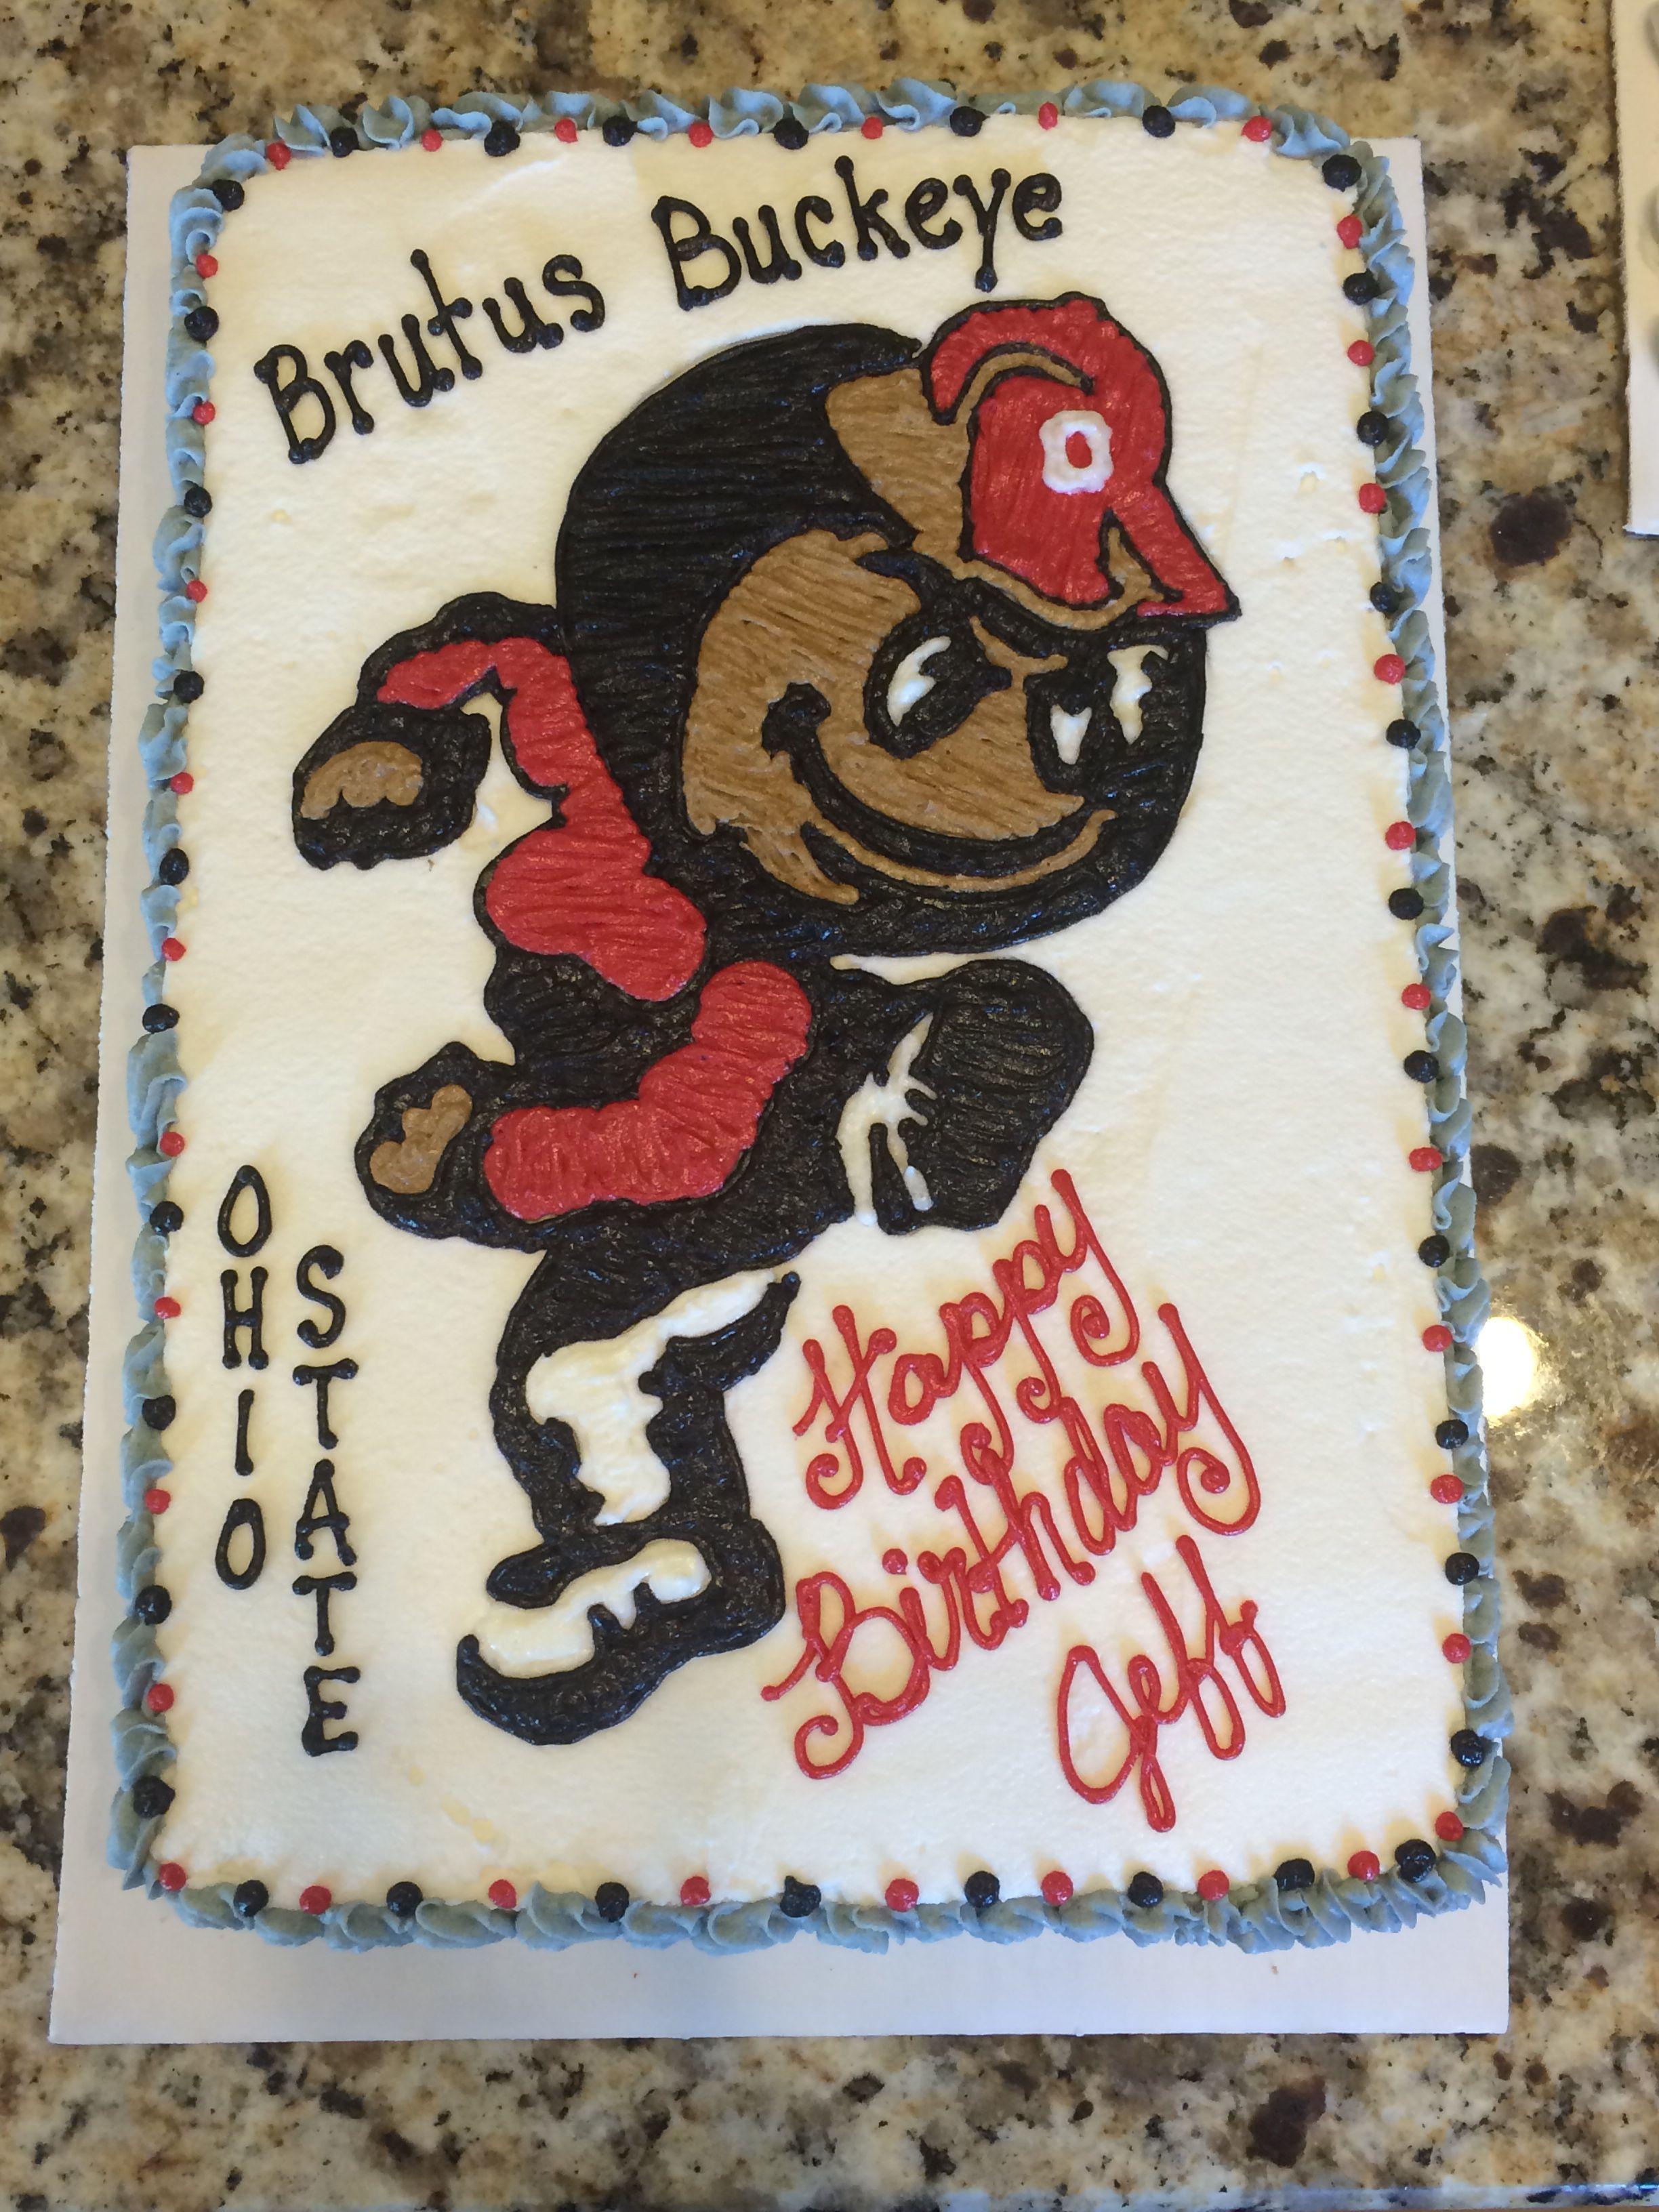 1 4 Sheet Ohio State Brutus Buckeye Cake 30 Call Jaci 740